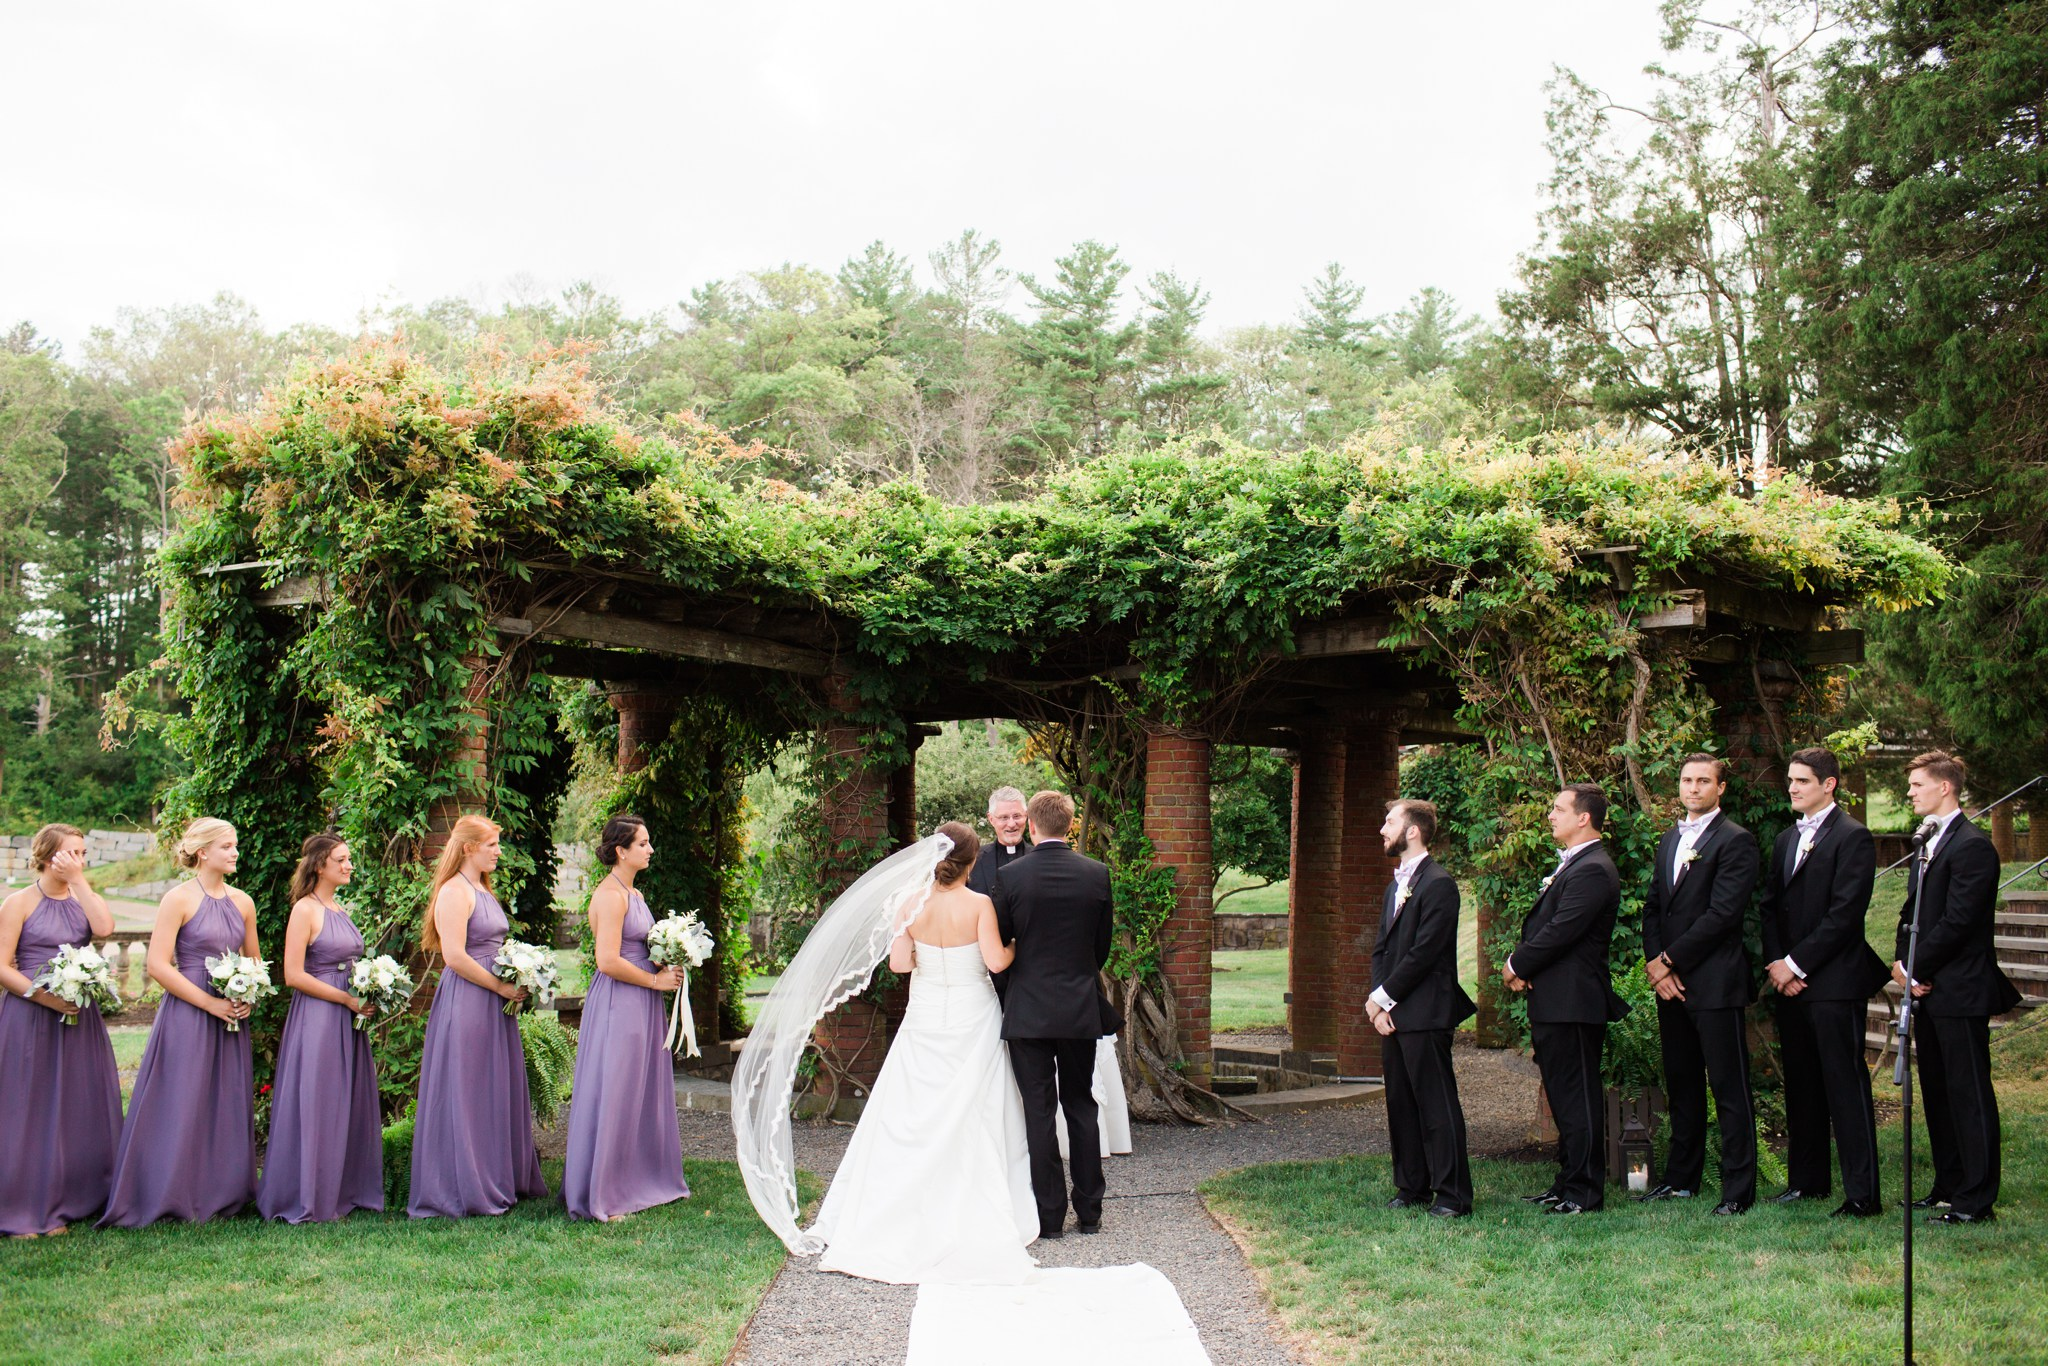 turner_hill_wedding_photos_00036.JPG